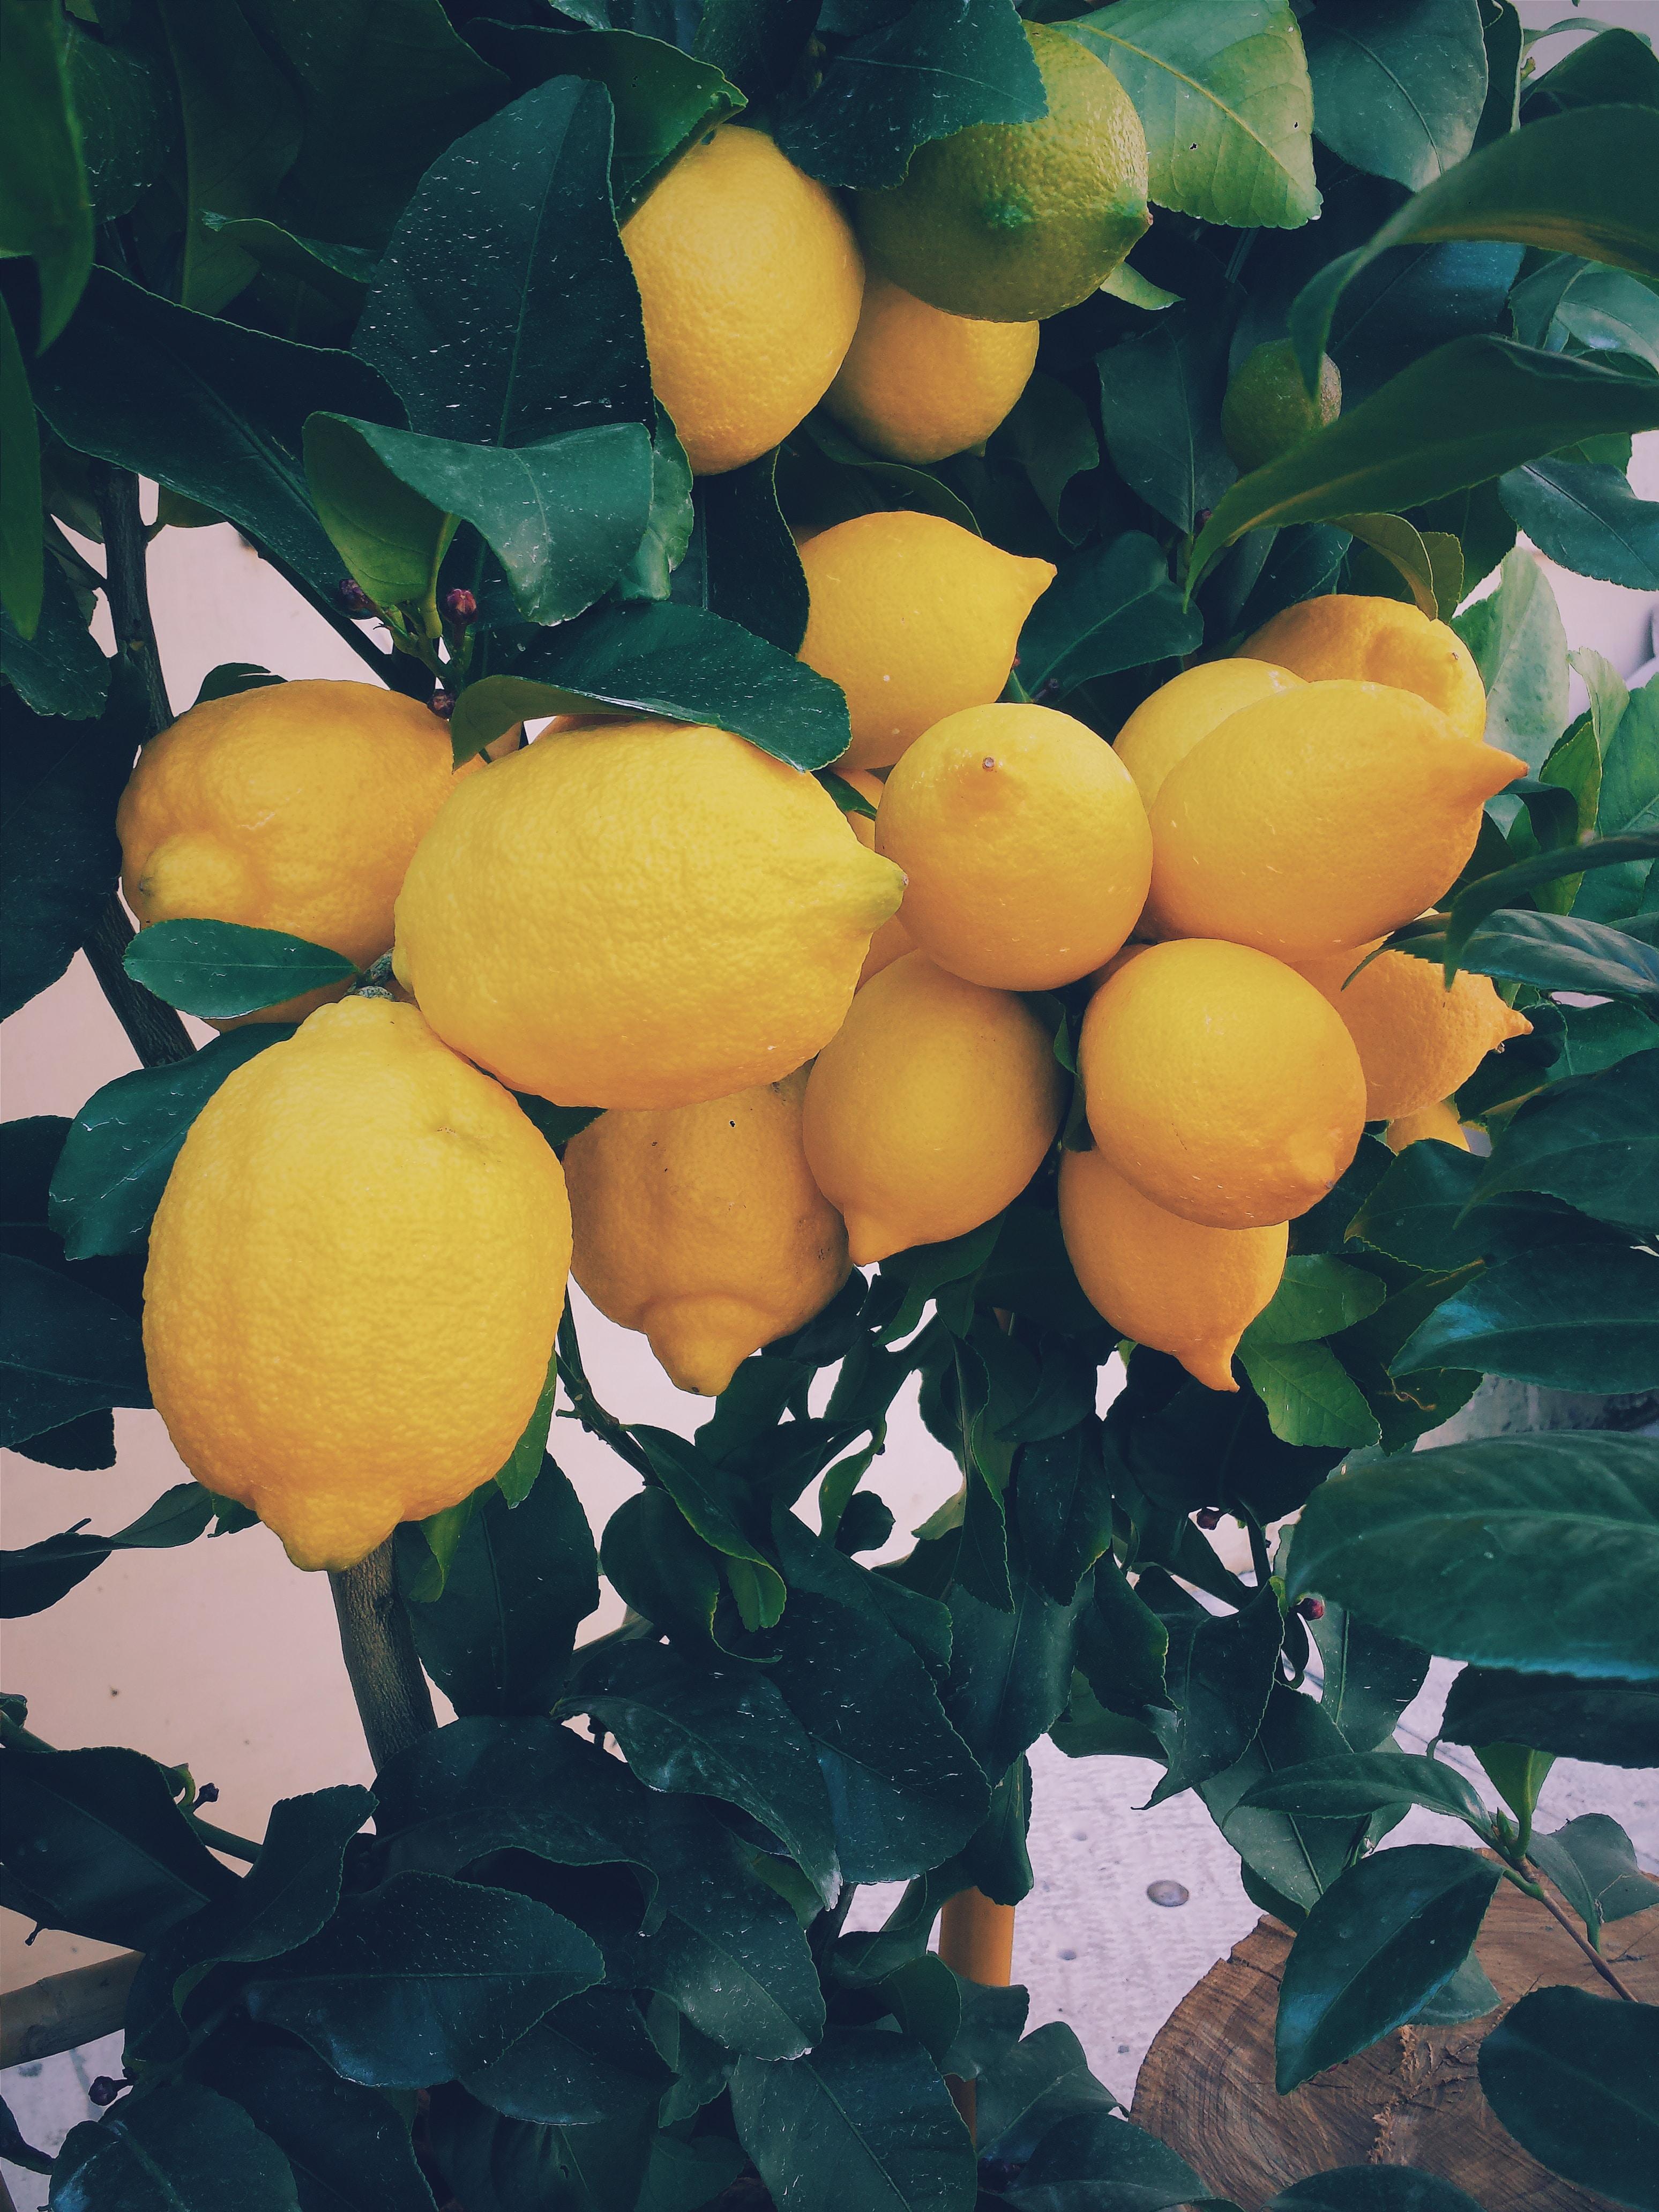 A cluster of large ripe lemons on a lemon tree